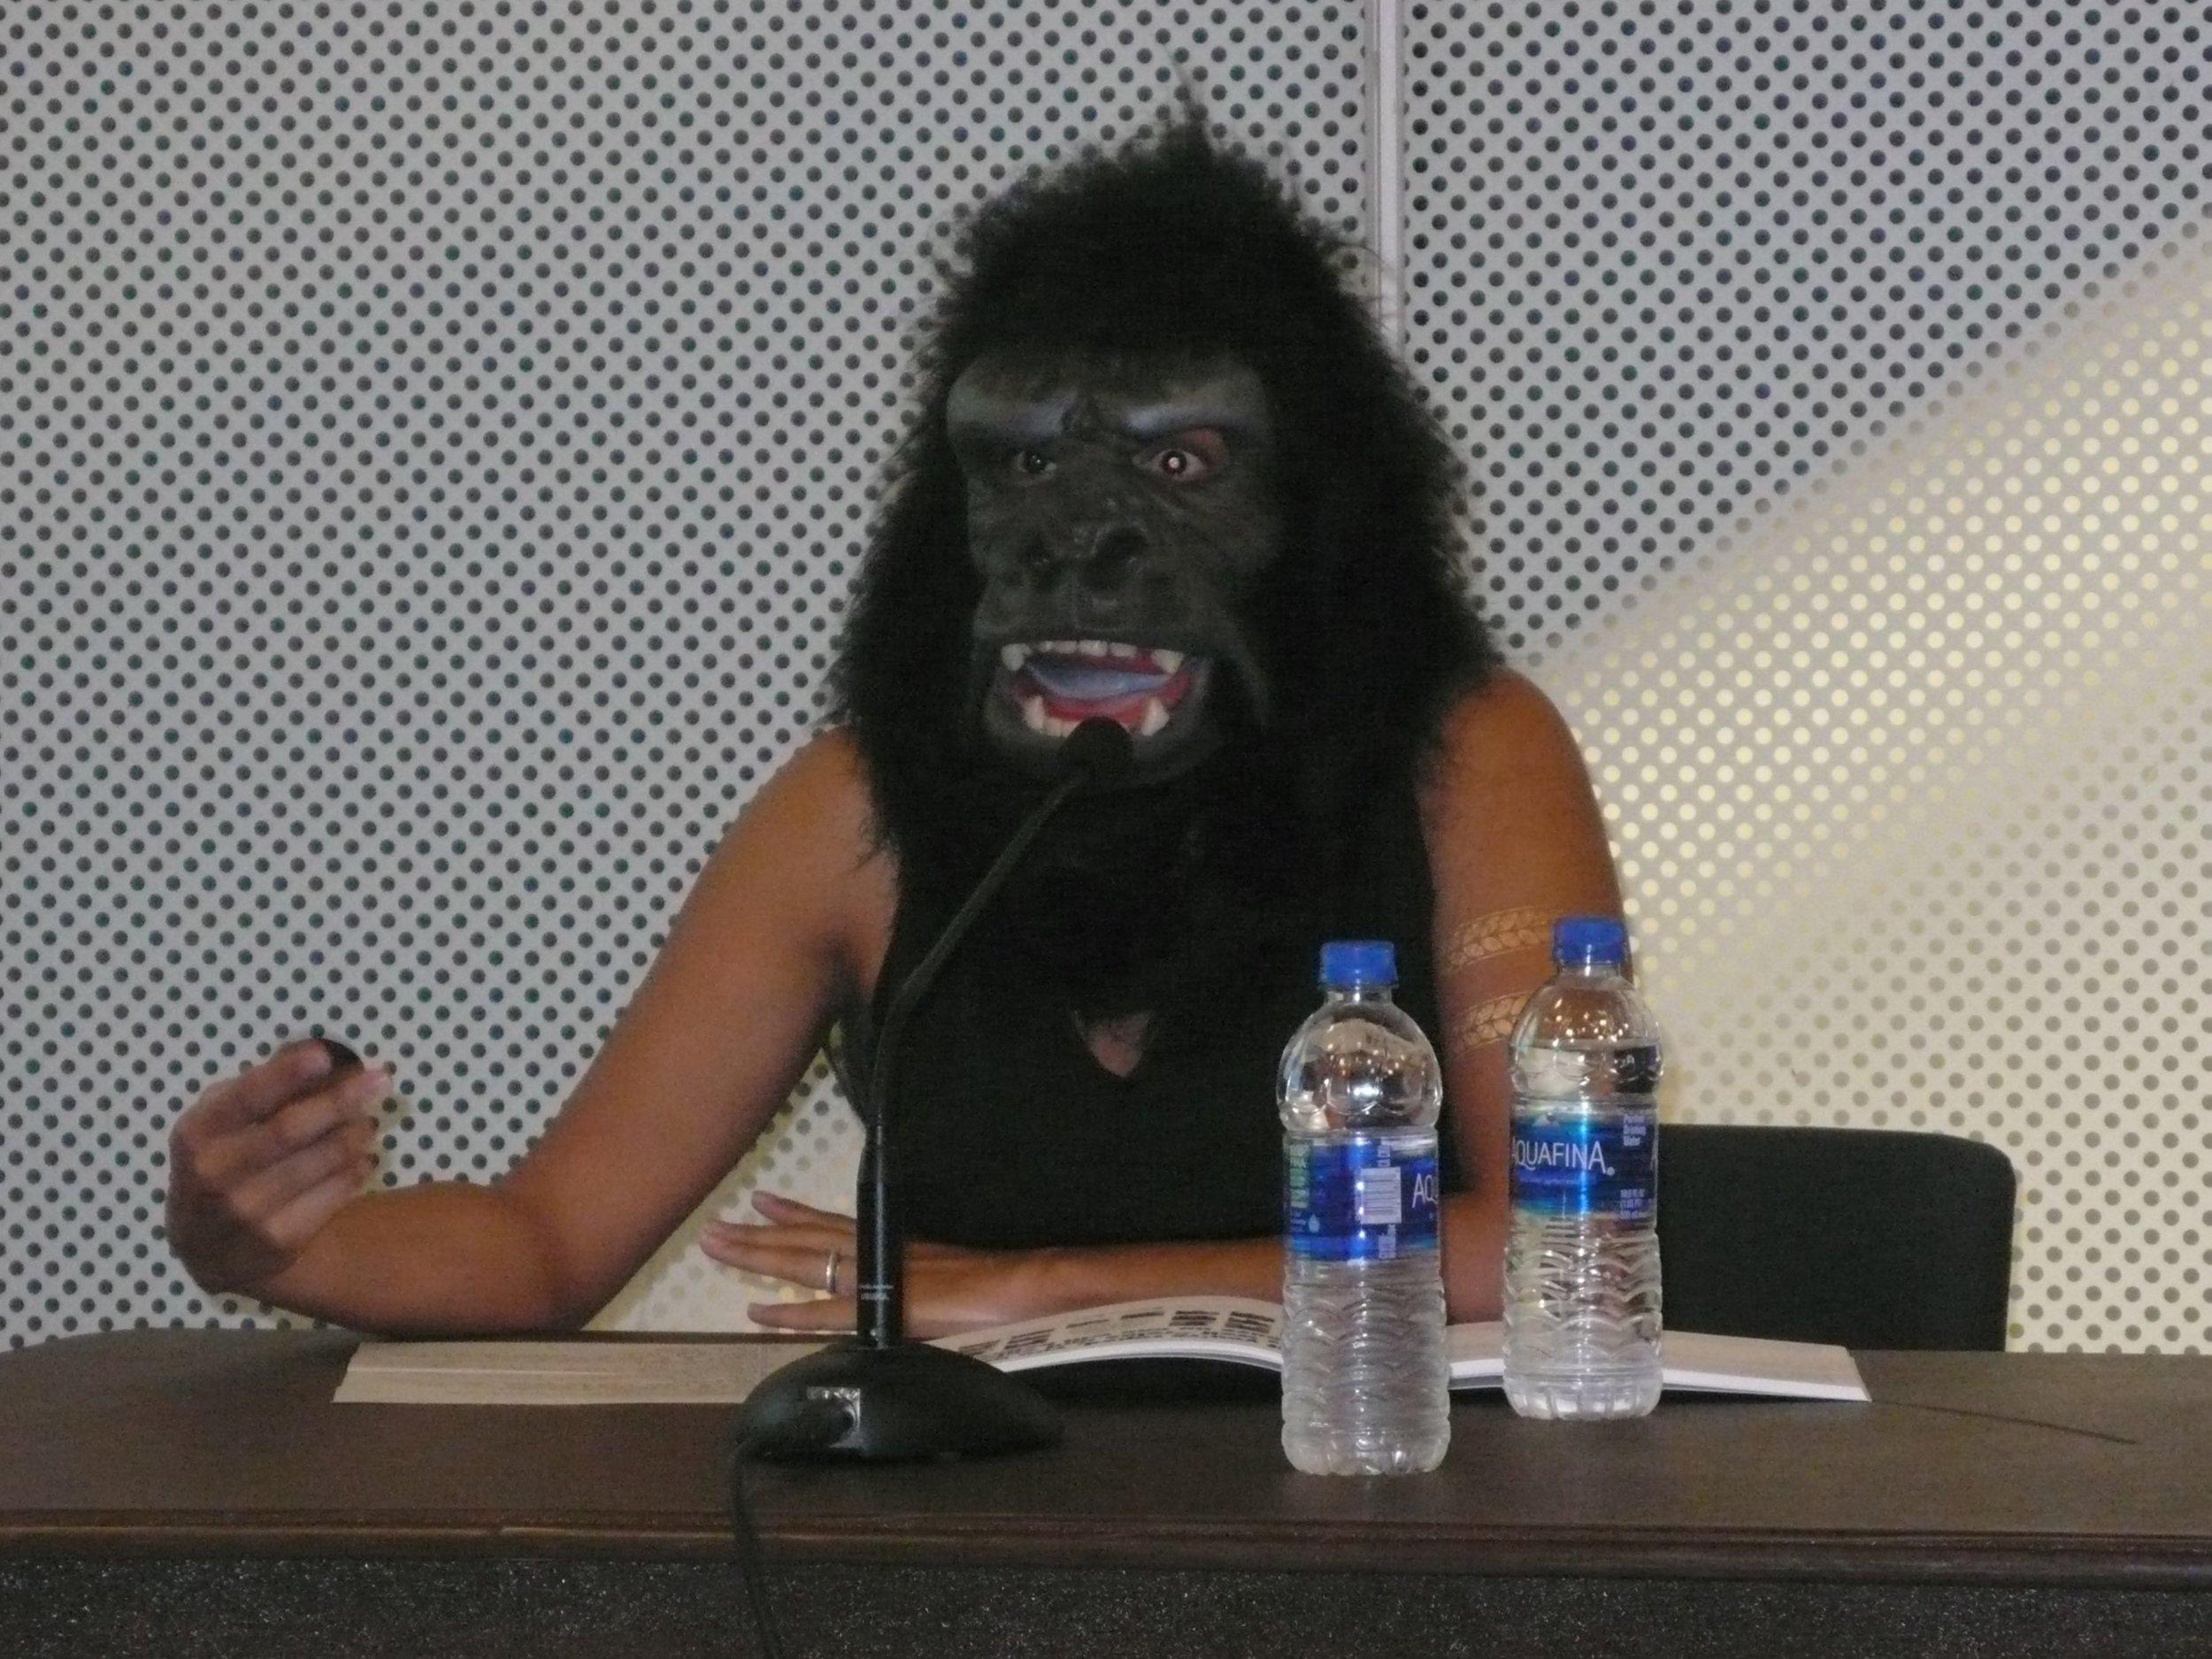 Zubeida Agha of Guerrilla Girls__The Un-Heroic Act_Symposium_Oct. 3 2018. Photo Jerzy Warman